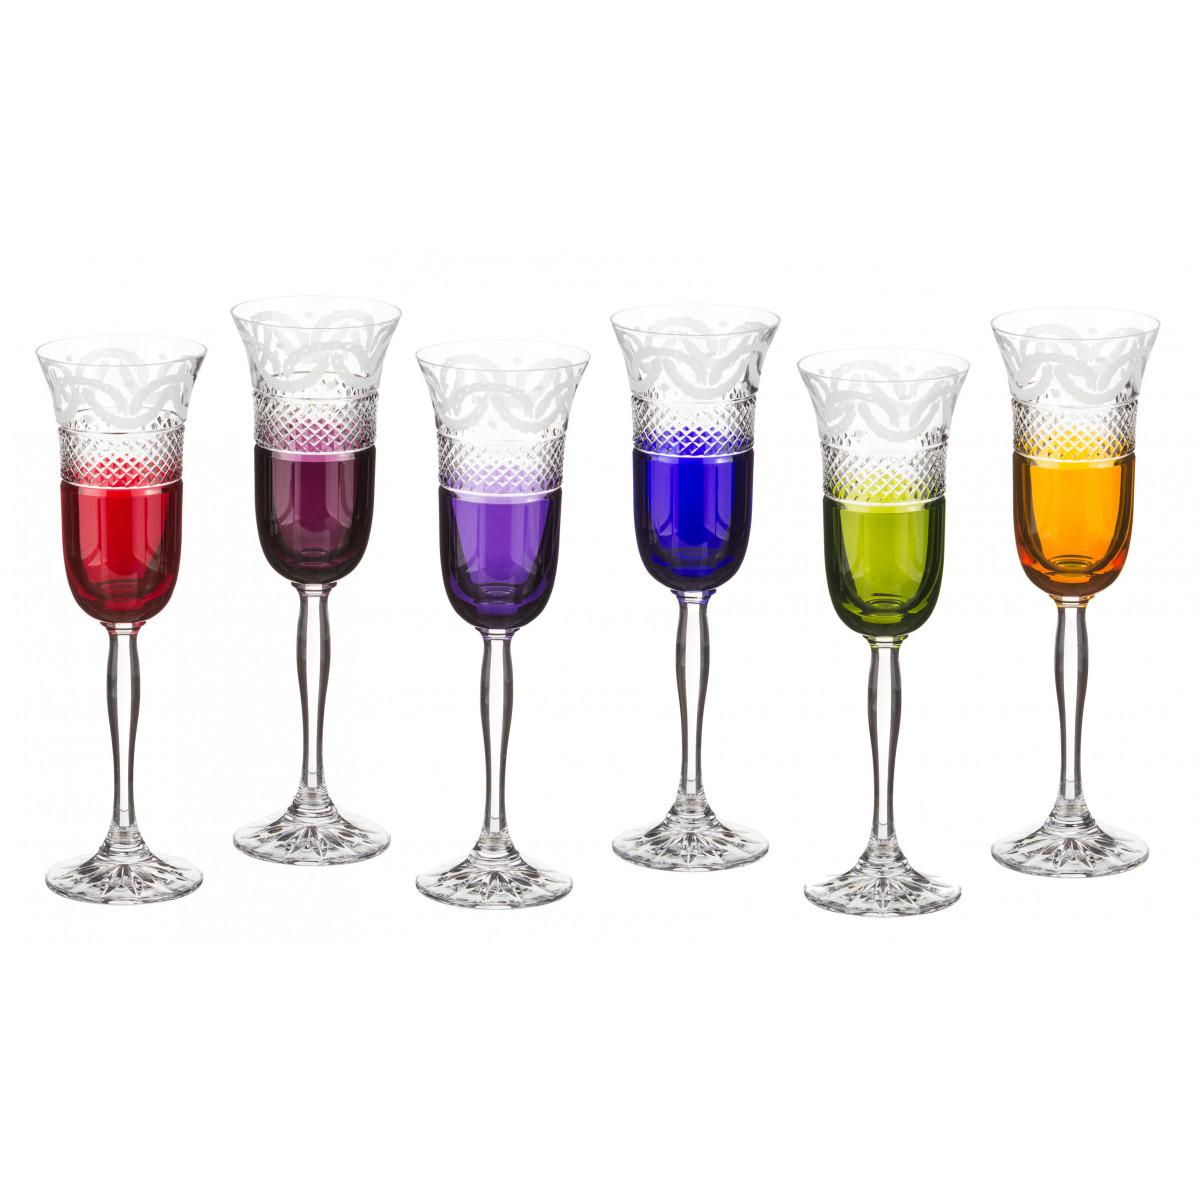 {} Julia Crystal Набор бокалов для шампанского Rae  (150 мл - 6 шт) набор бокалов crystalex ангела оптика отводка зол 6шт 400мл бренди стекло